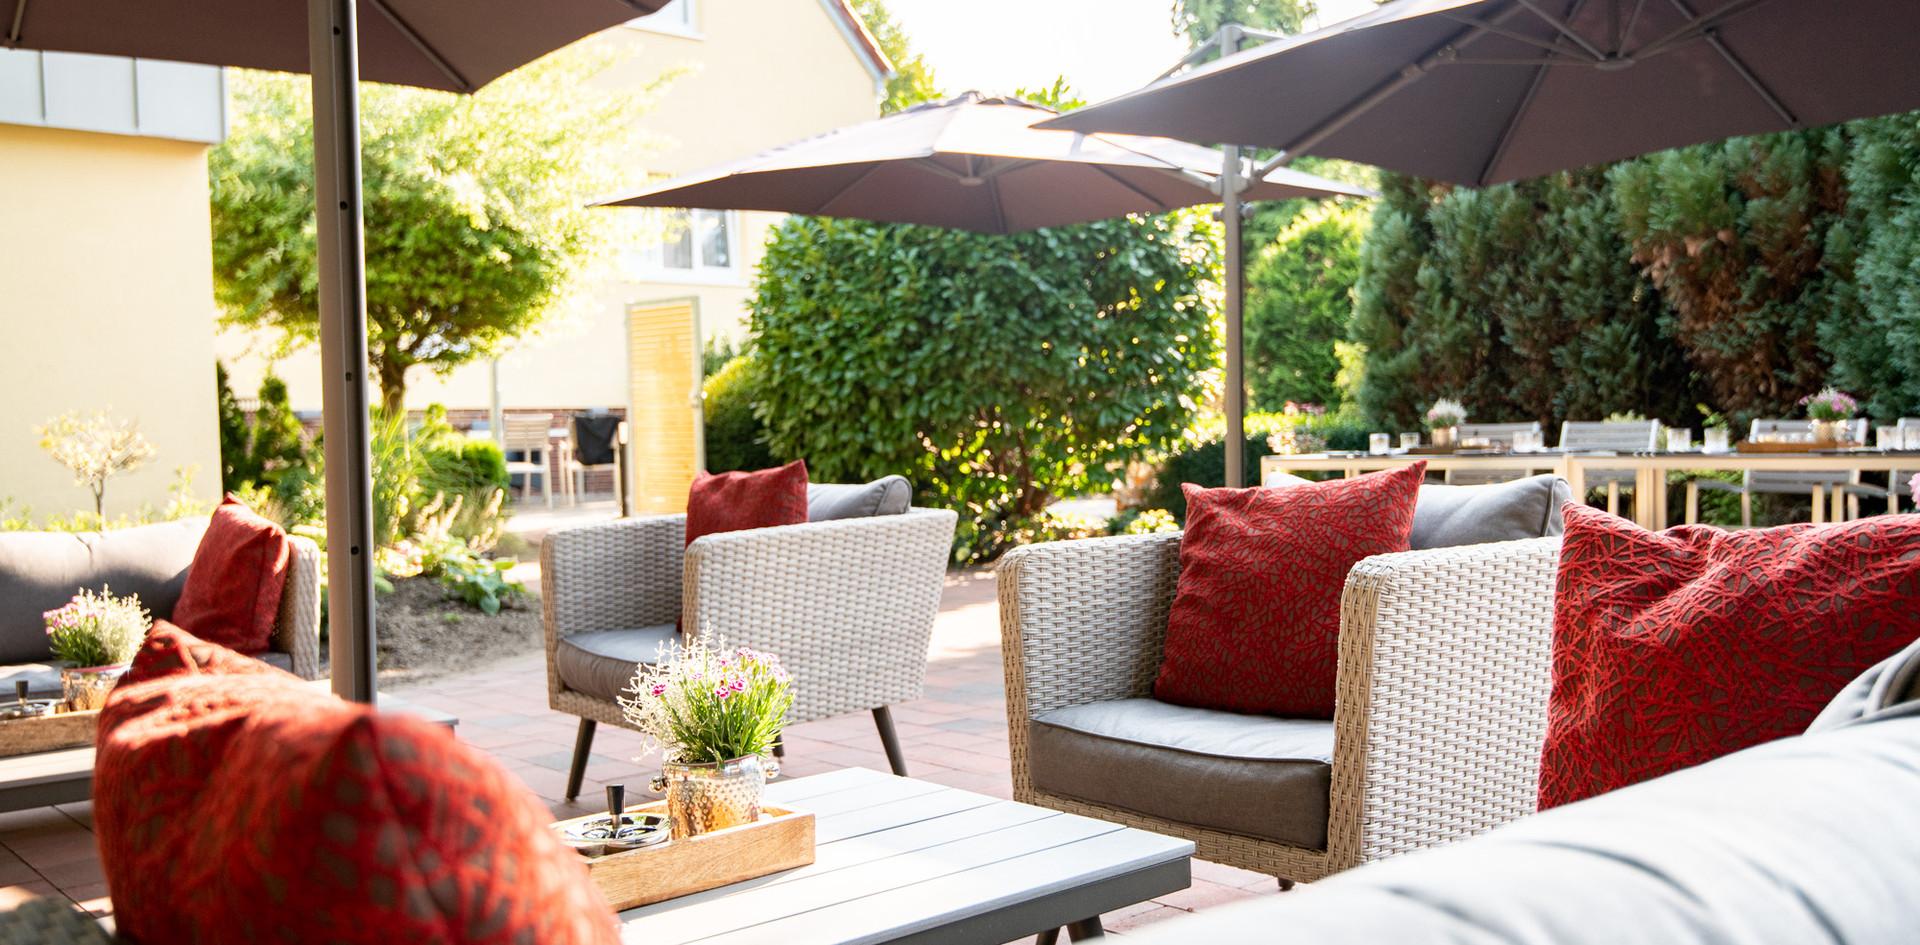 Sessel Gartenterrasse Hotel Wegner - the culinary art hotel